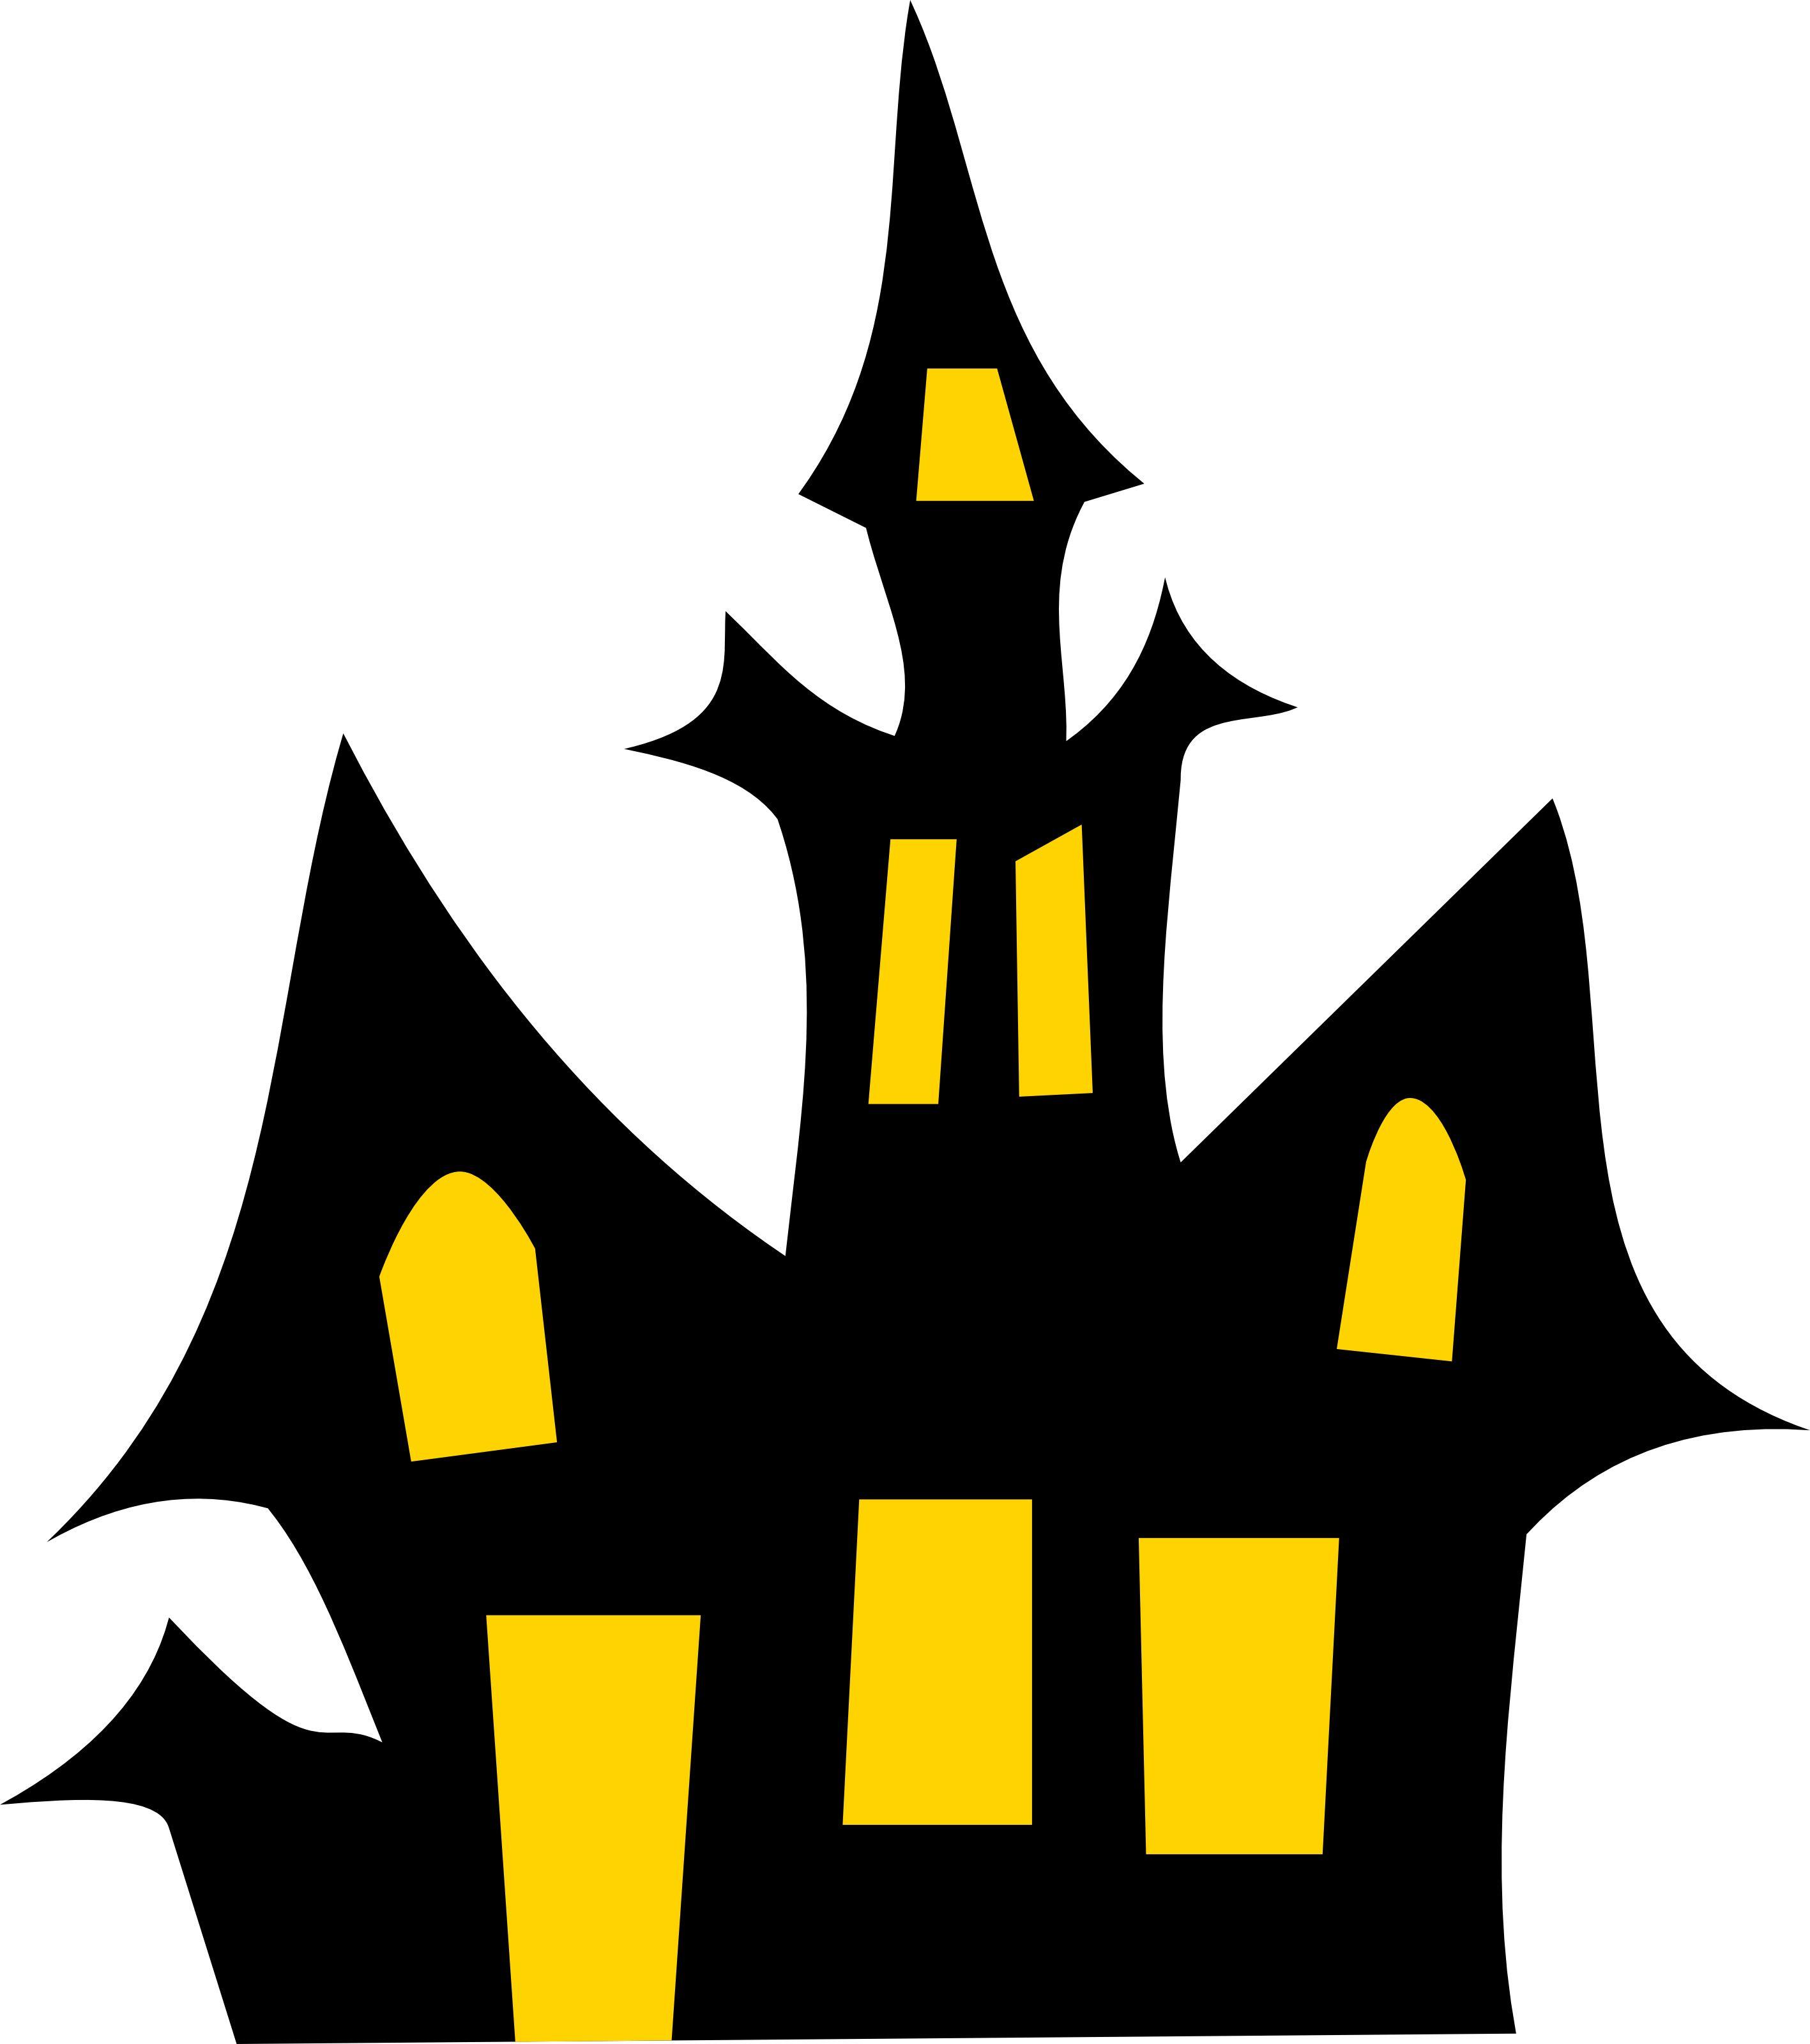 Clipart halloween haunted house. Free vector illustration